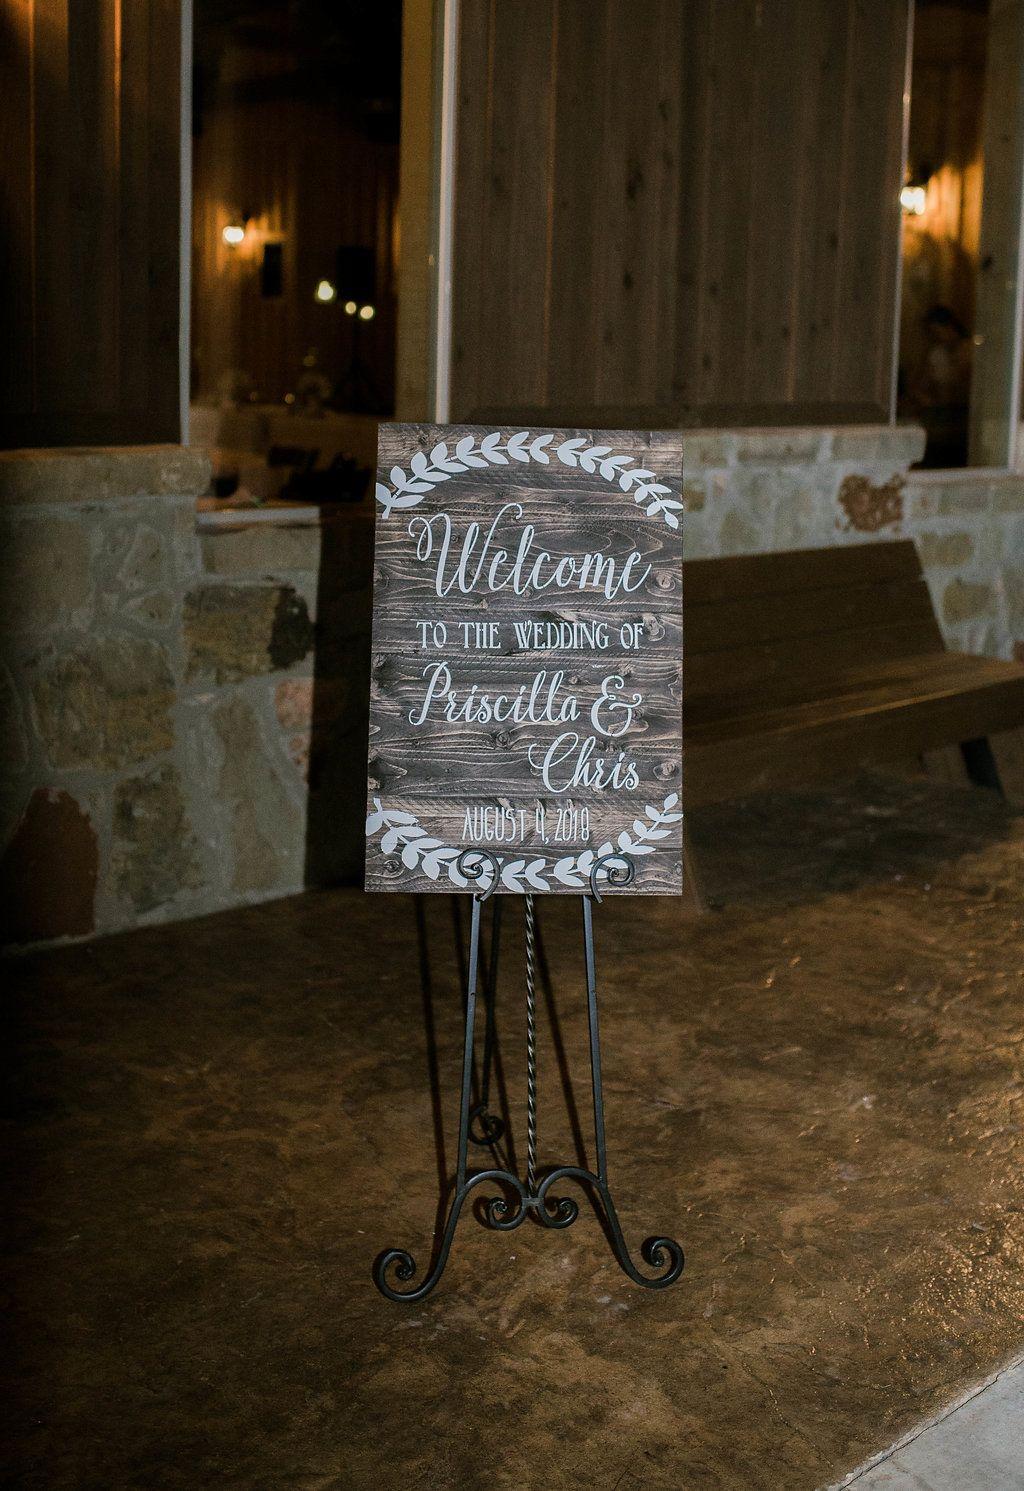 Wedding reception wedding decorations 2018 november 2018 Pinehaven Wedding Venue  wedding signs  Pinterest  Wedding